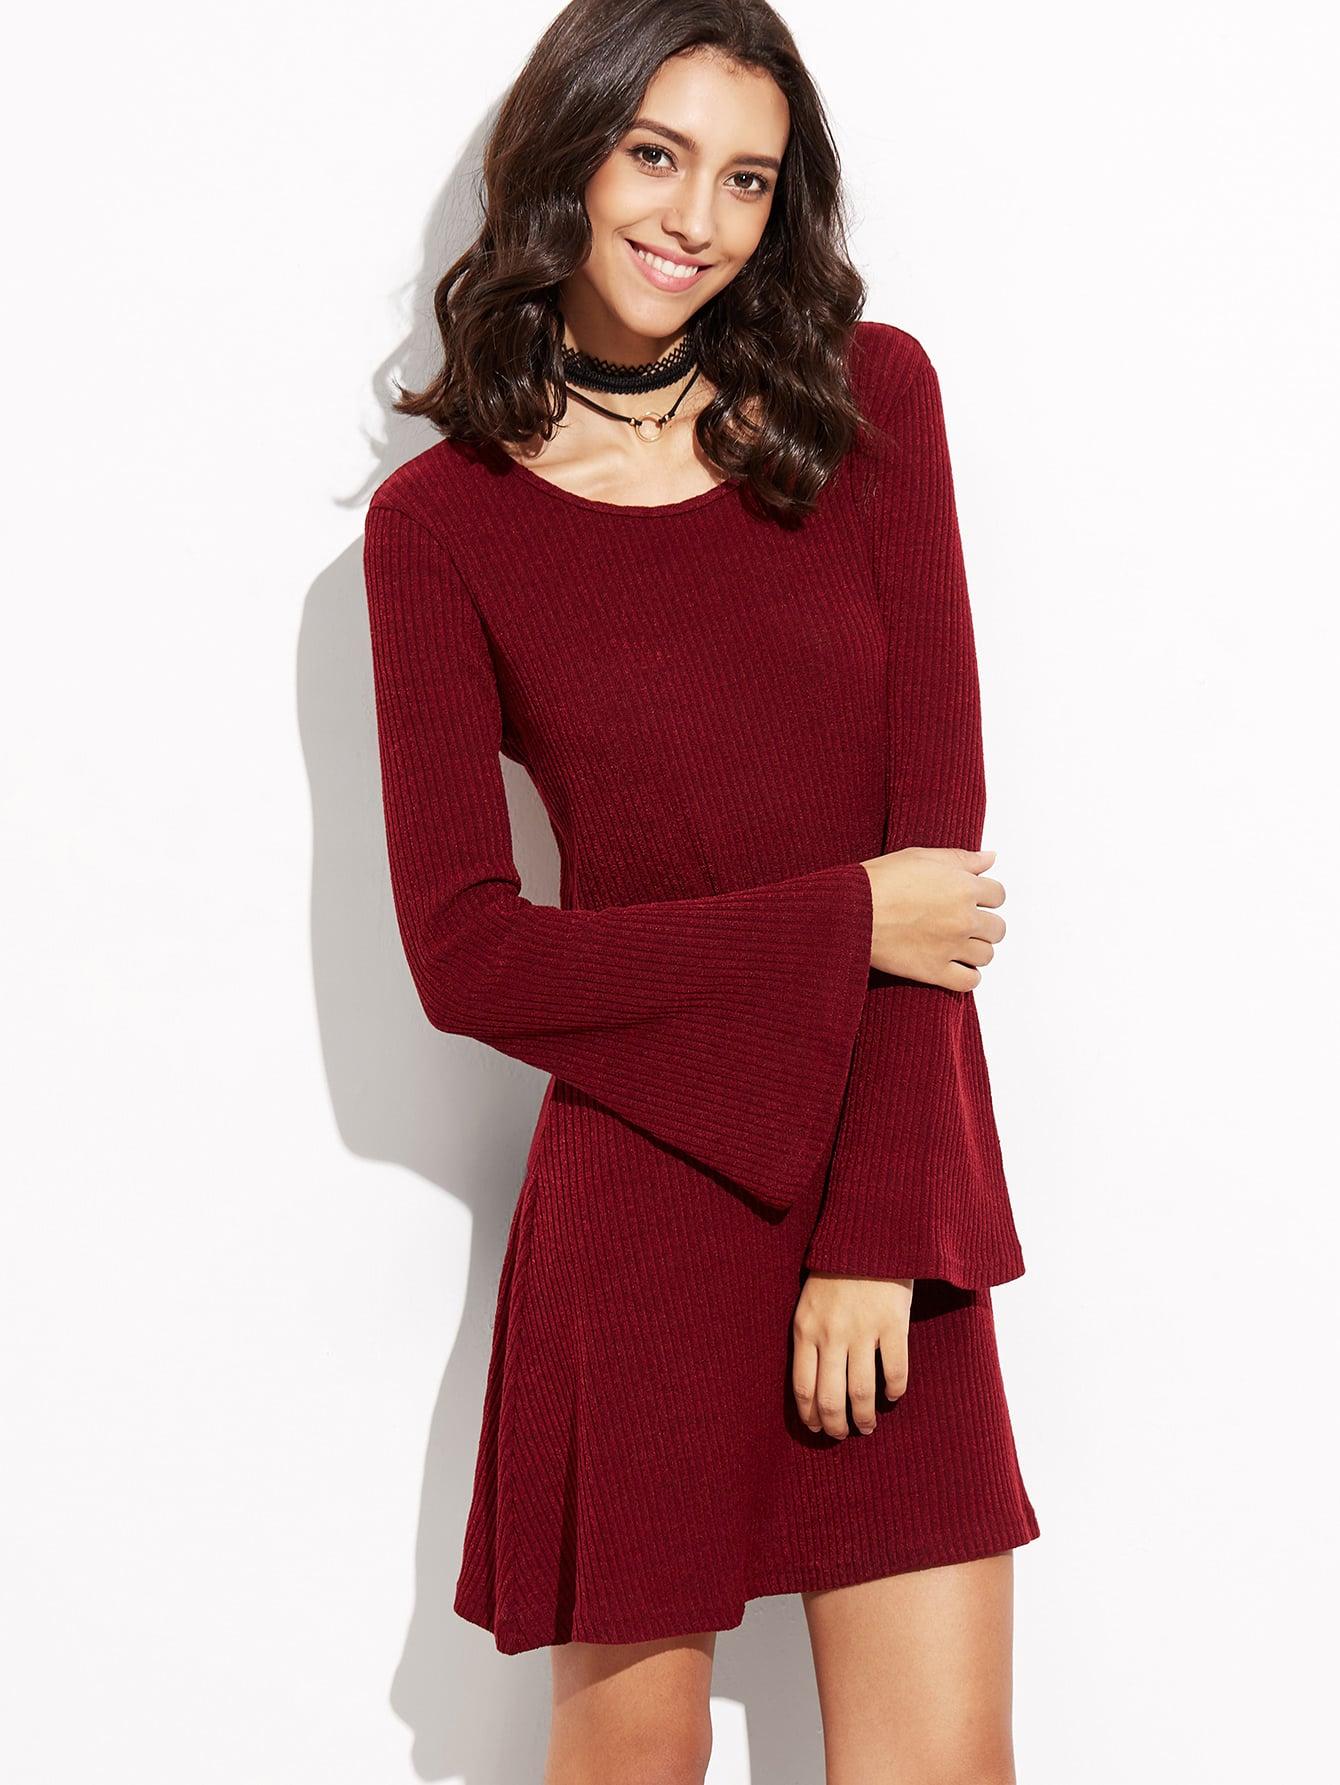 Burgundy Bell Sleeve Ribbed Dress dress160826402